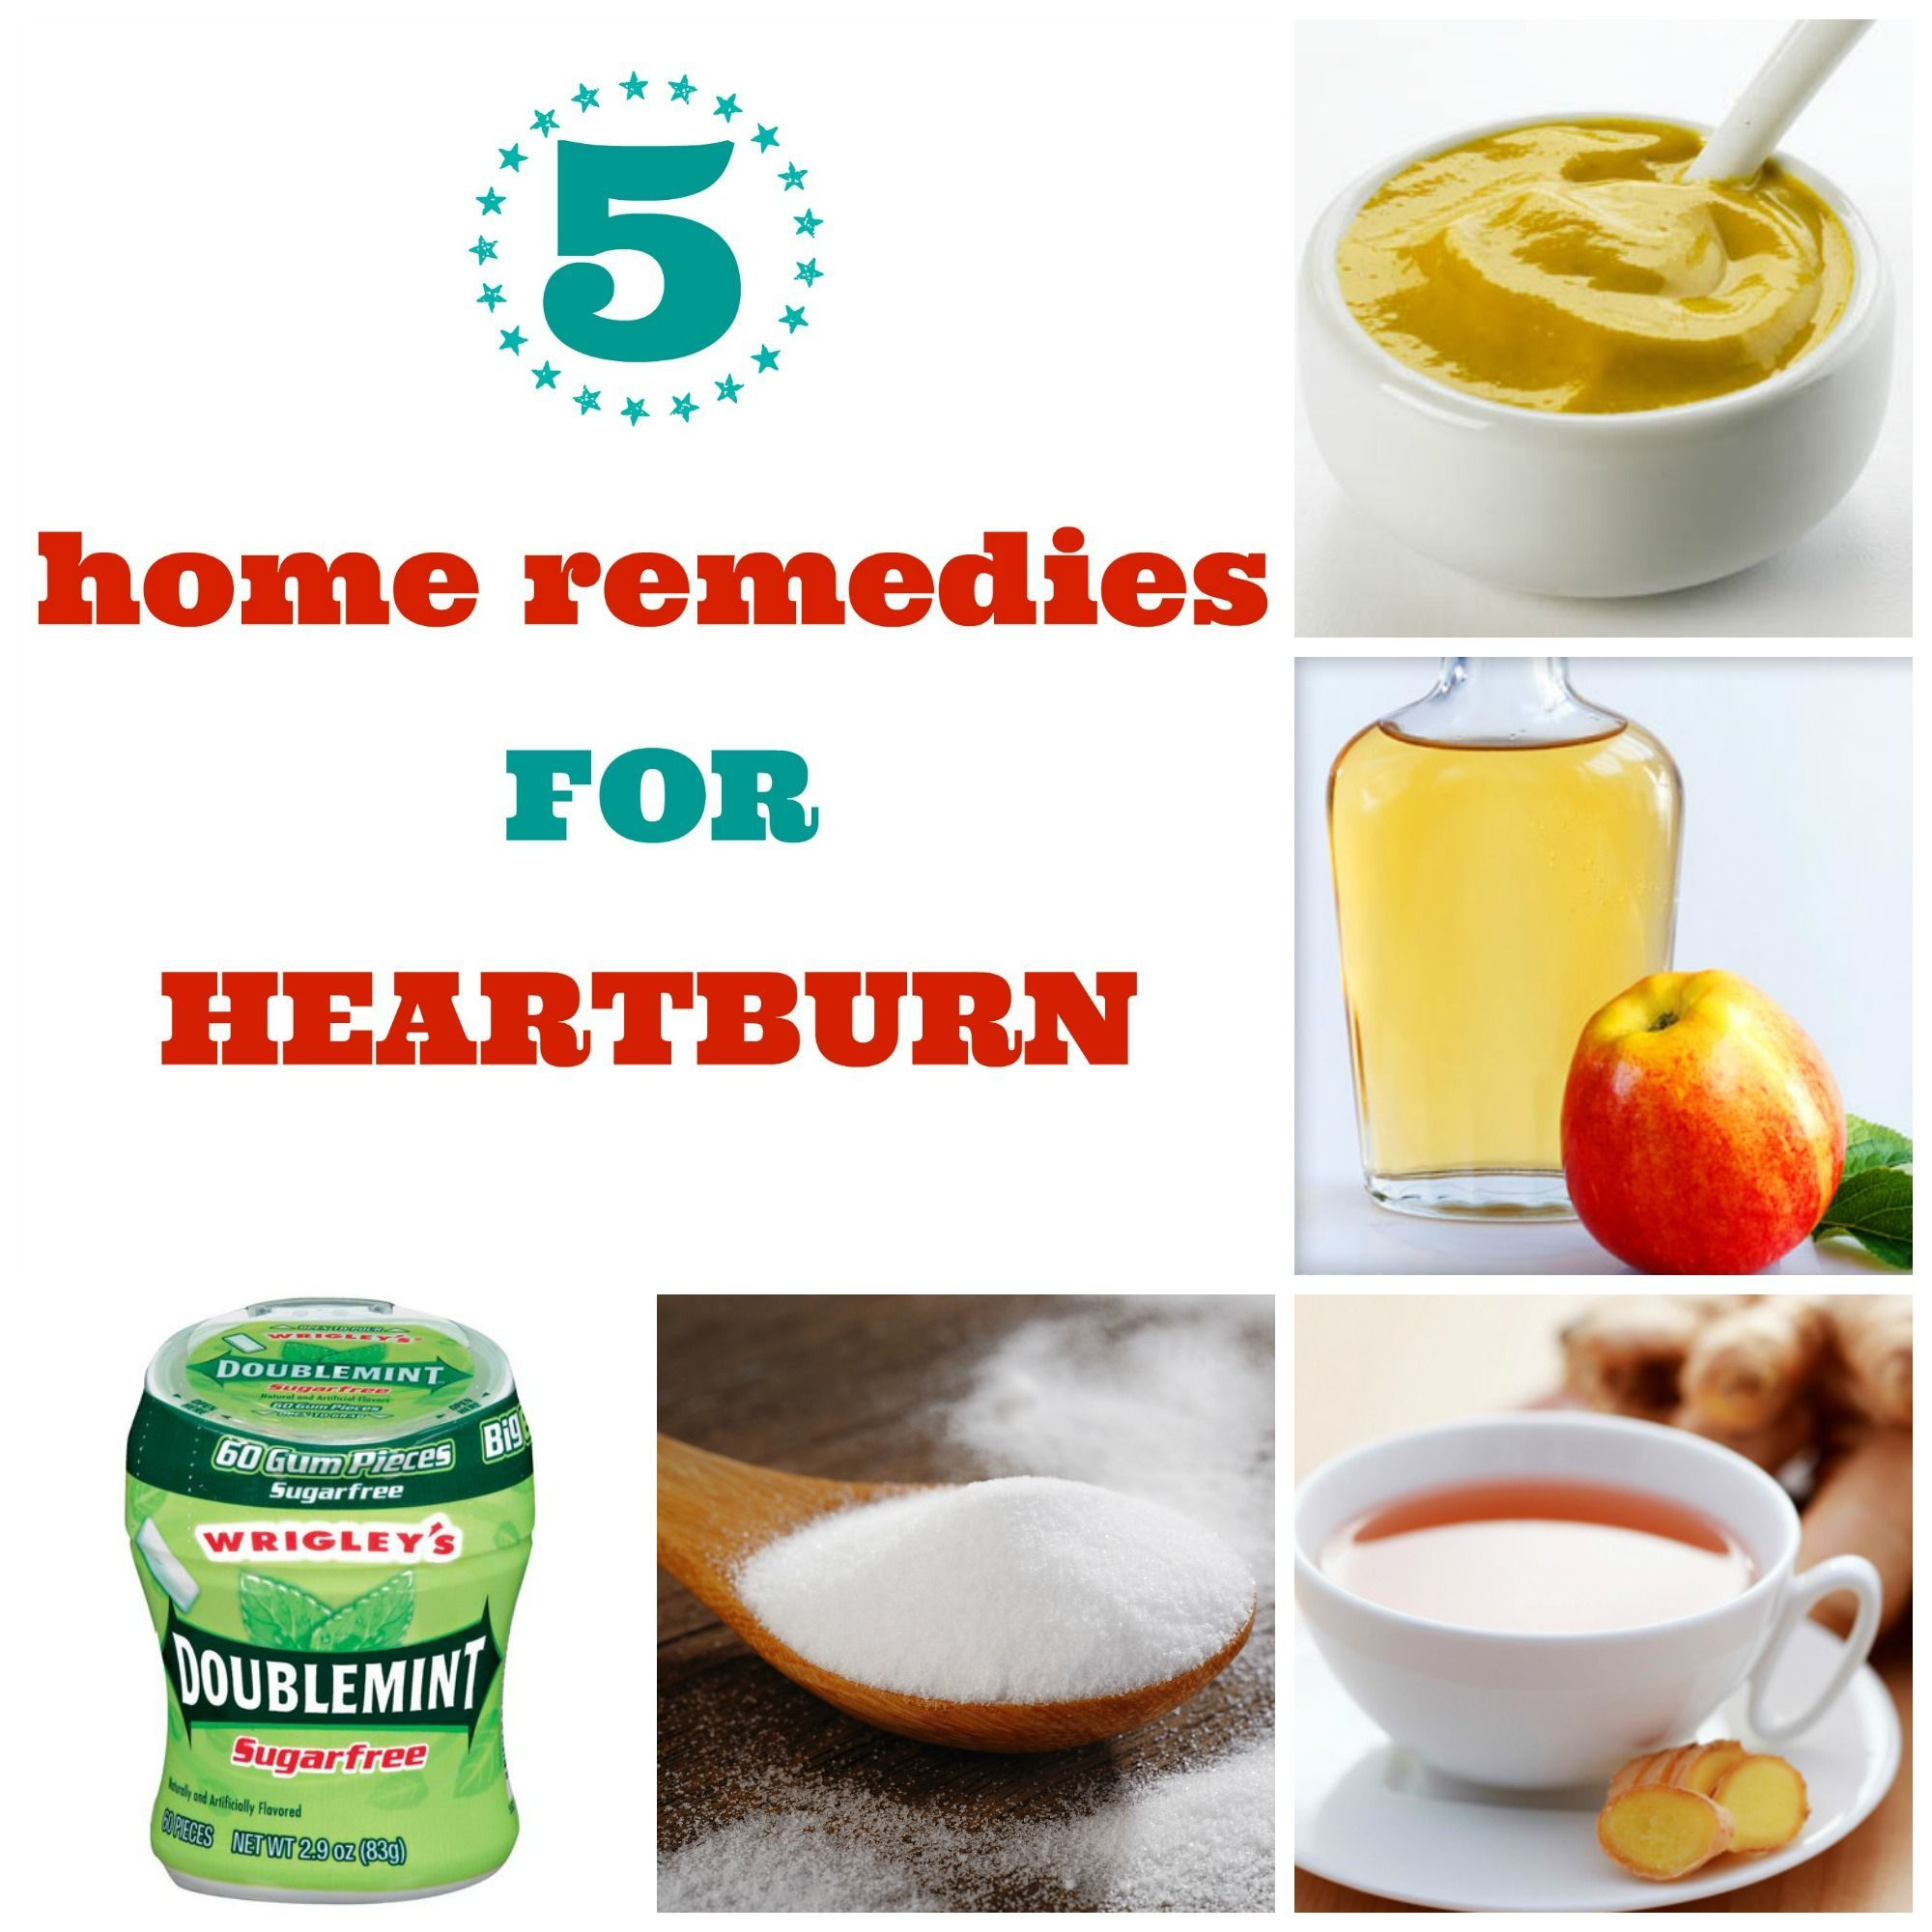 Heartburn Home Remedies  Heartburn Remedies  Pinterest  Heartburn